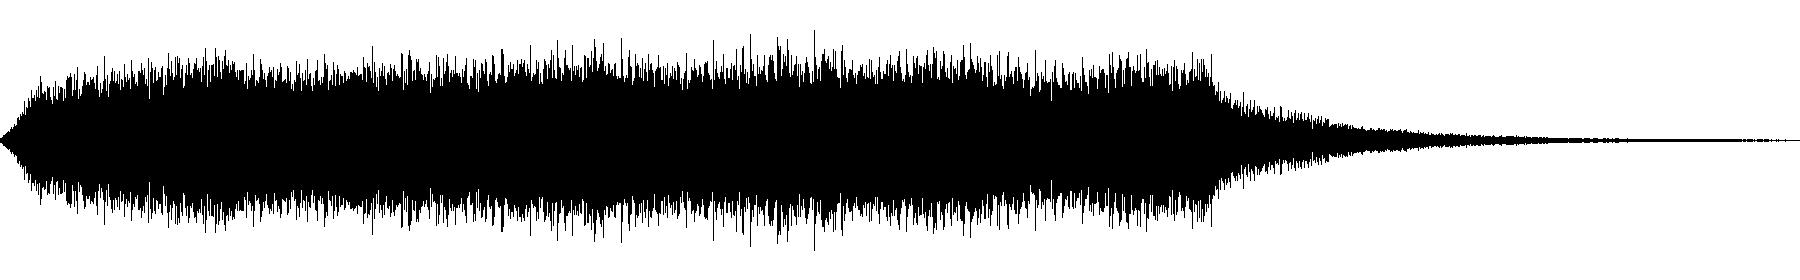 organ f6